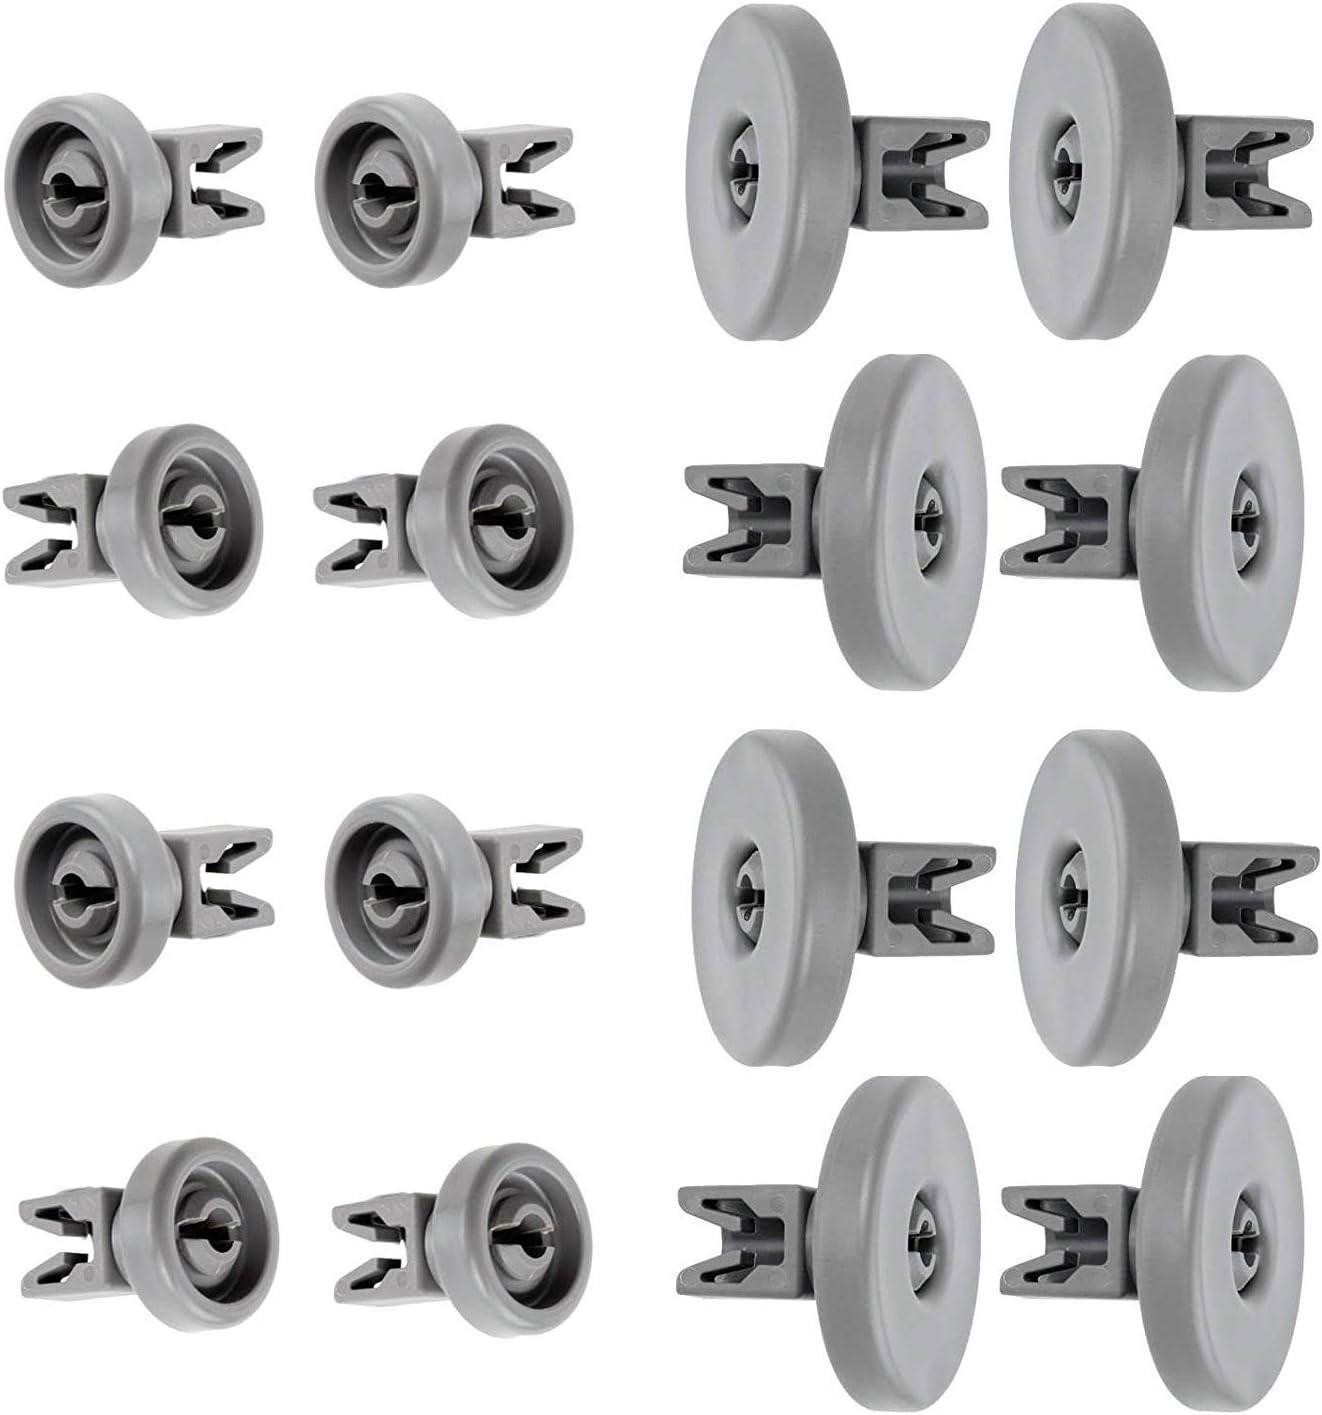 Set Lummar ruote lavastoviglie Rex Electrolux Techna Zanussi Aeg Favorit Juno Privileg Fortschritt Quelle, 16 ruote cestello inferiore superiore